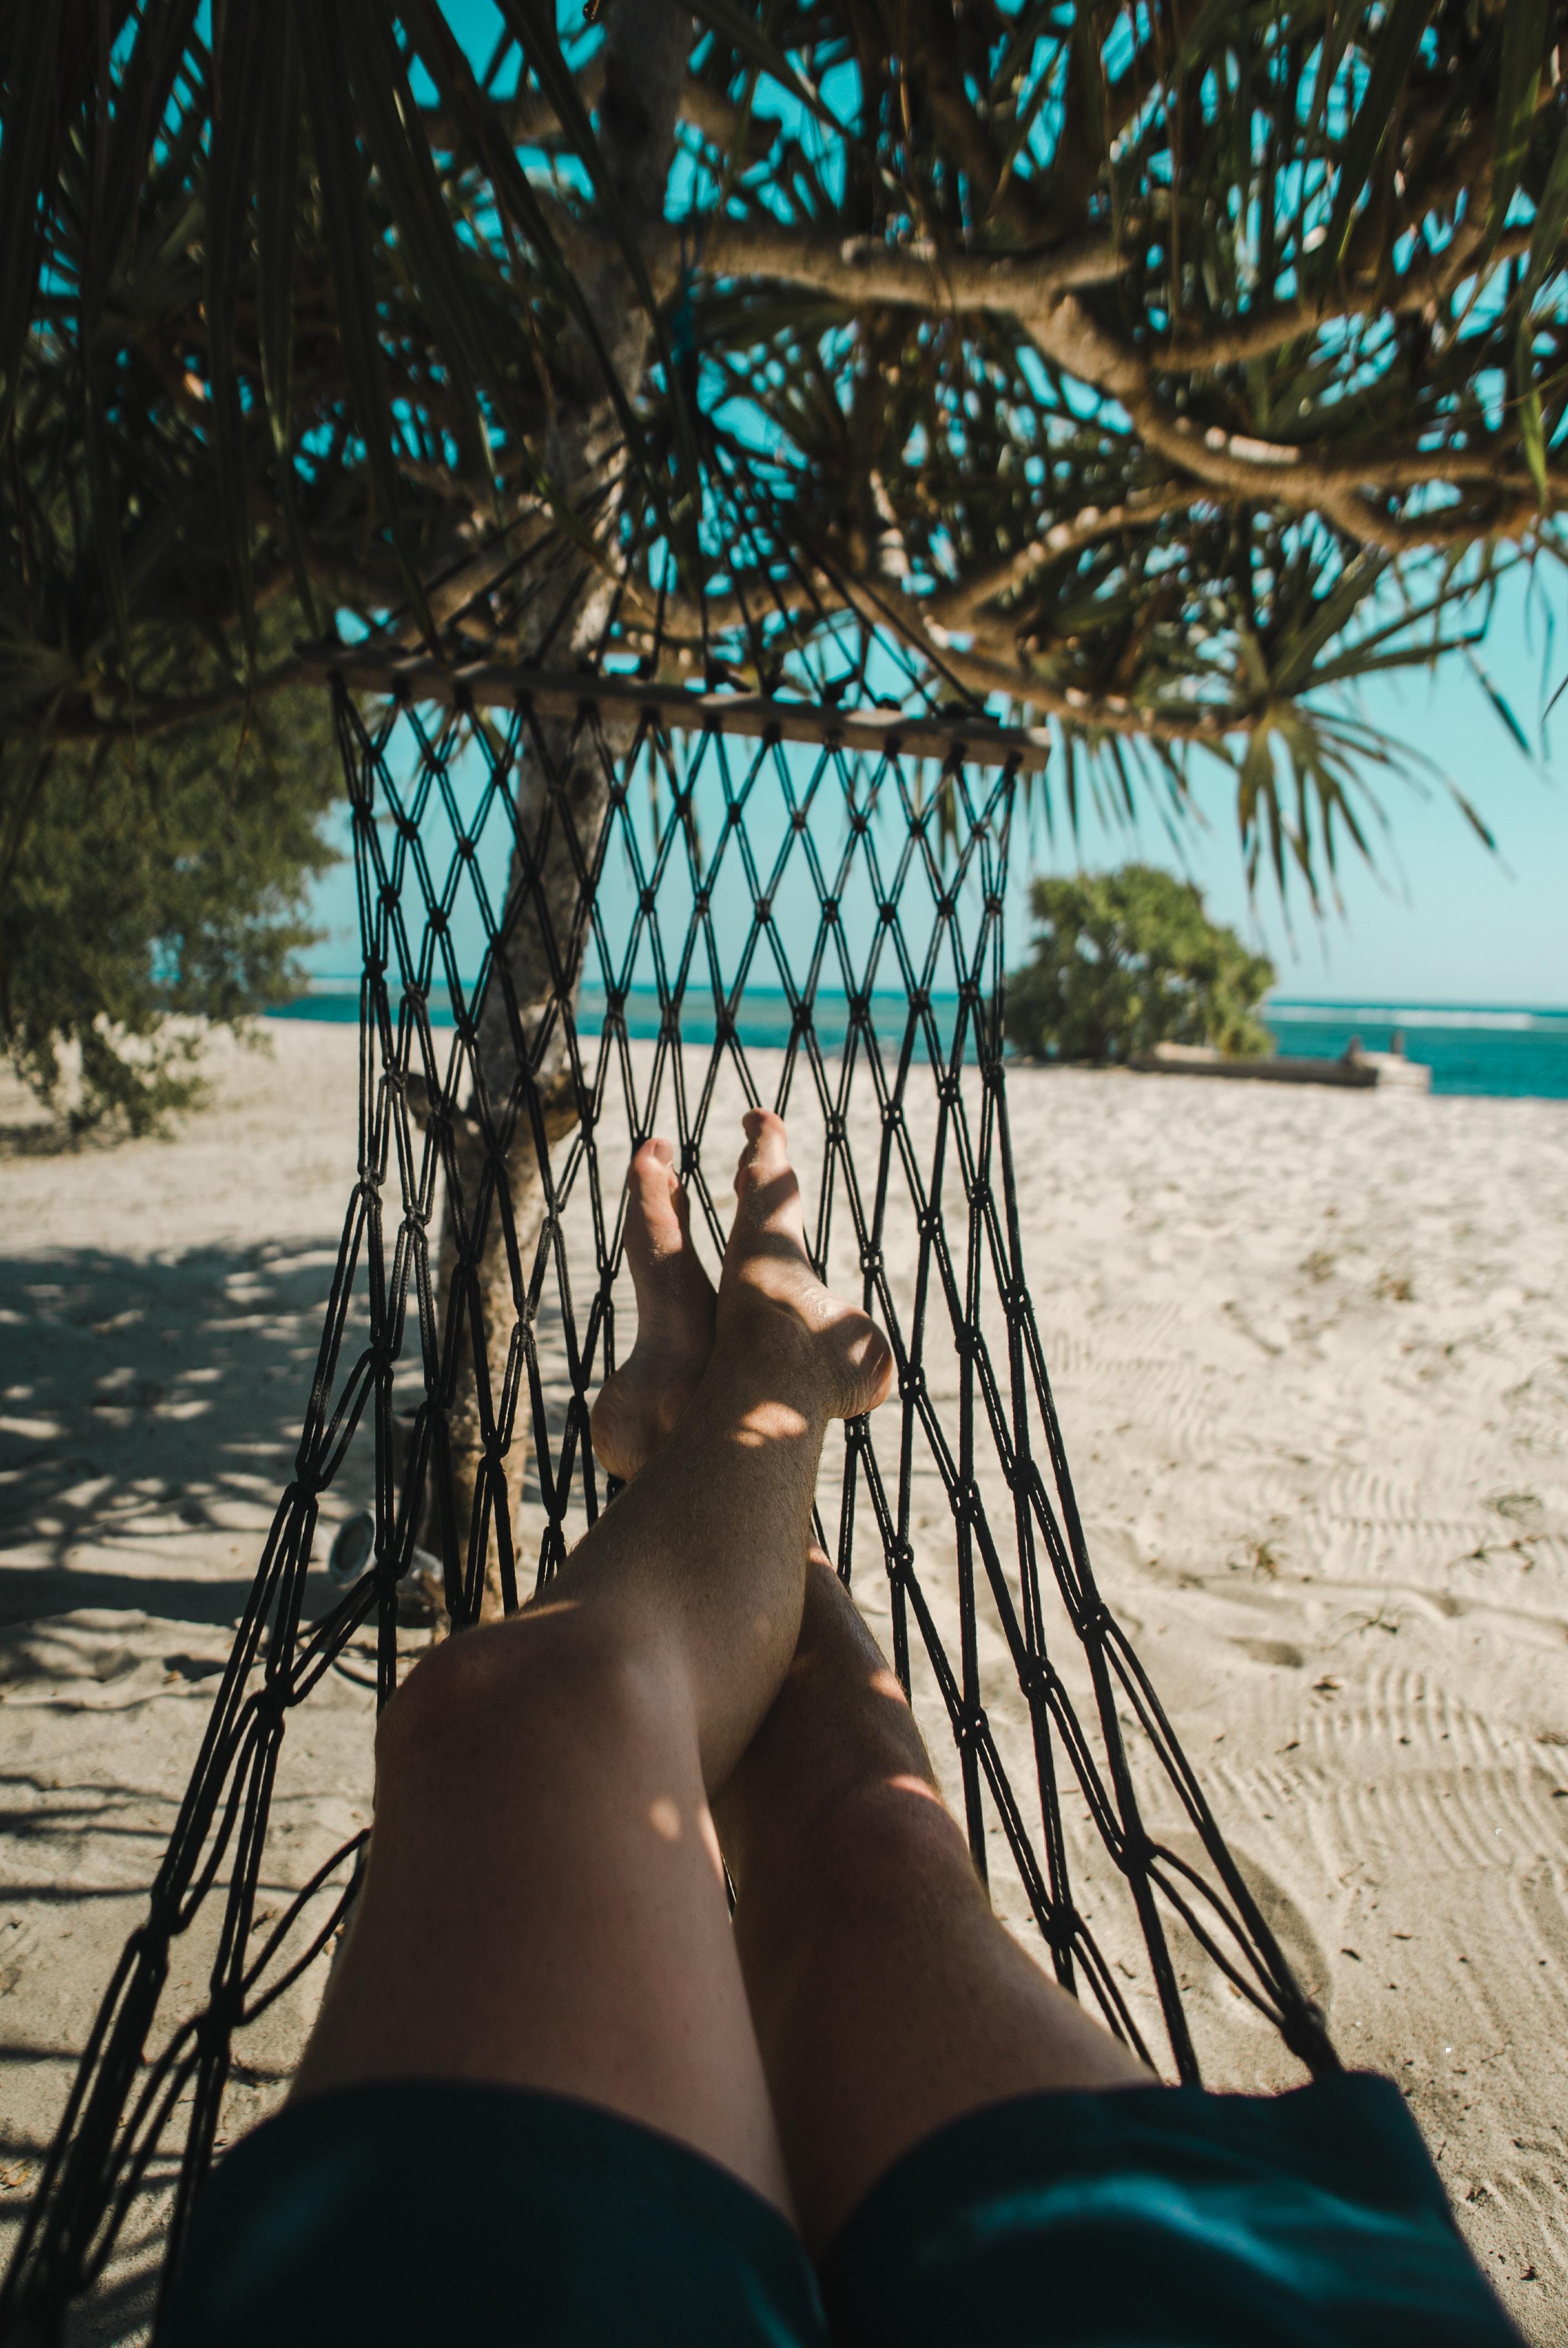 woman lying on the hammock